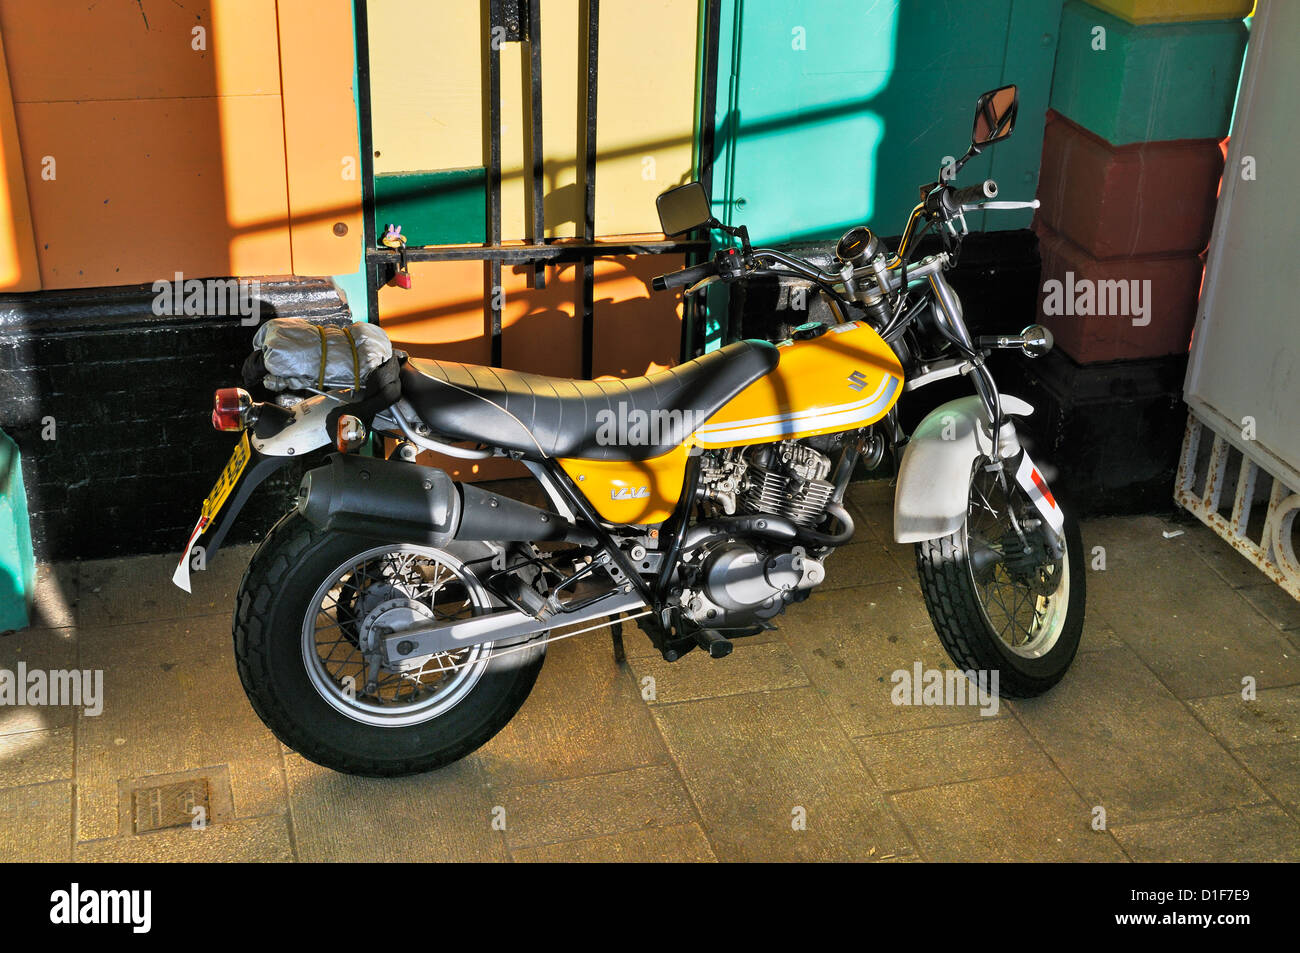 Suzuki motorbike - Stock Image